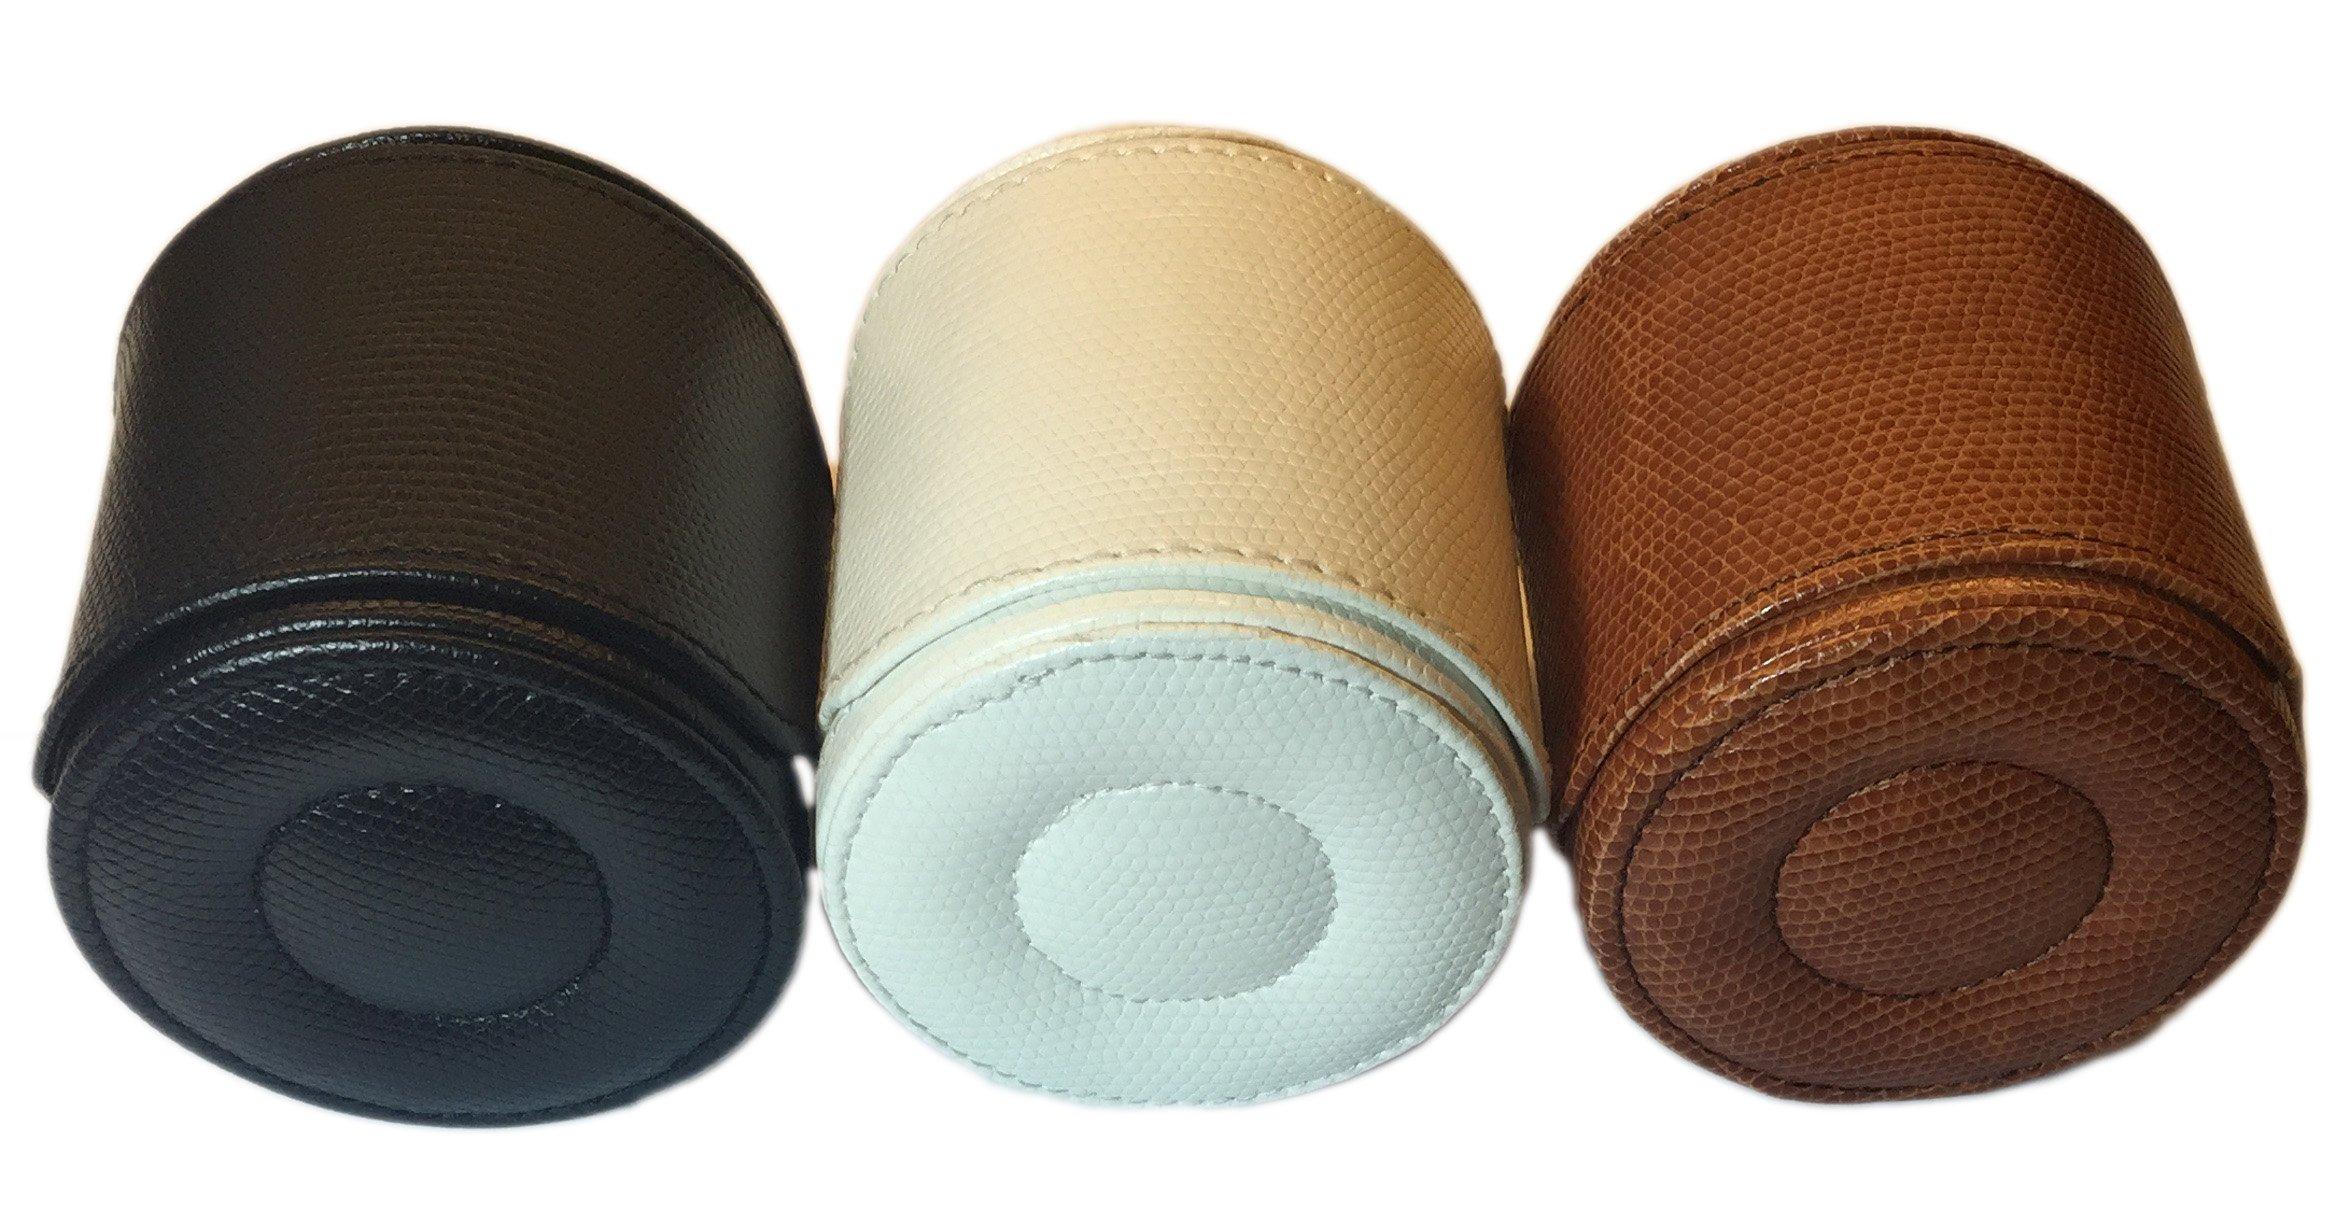 Single Travel Watch Case - Black - Faux Leather